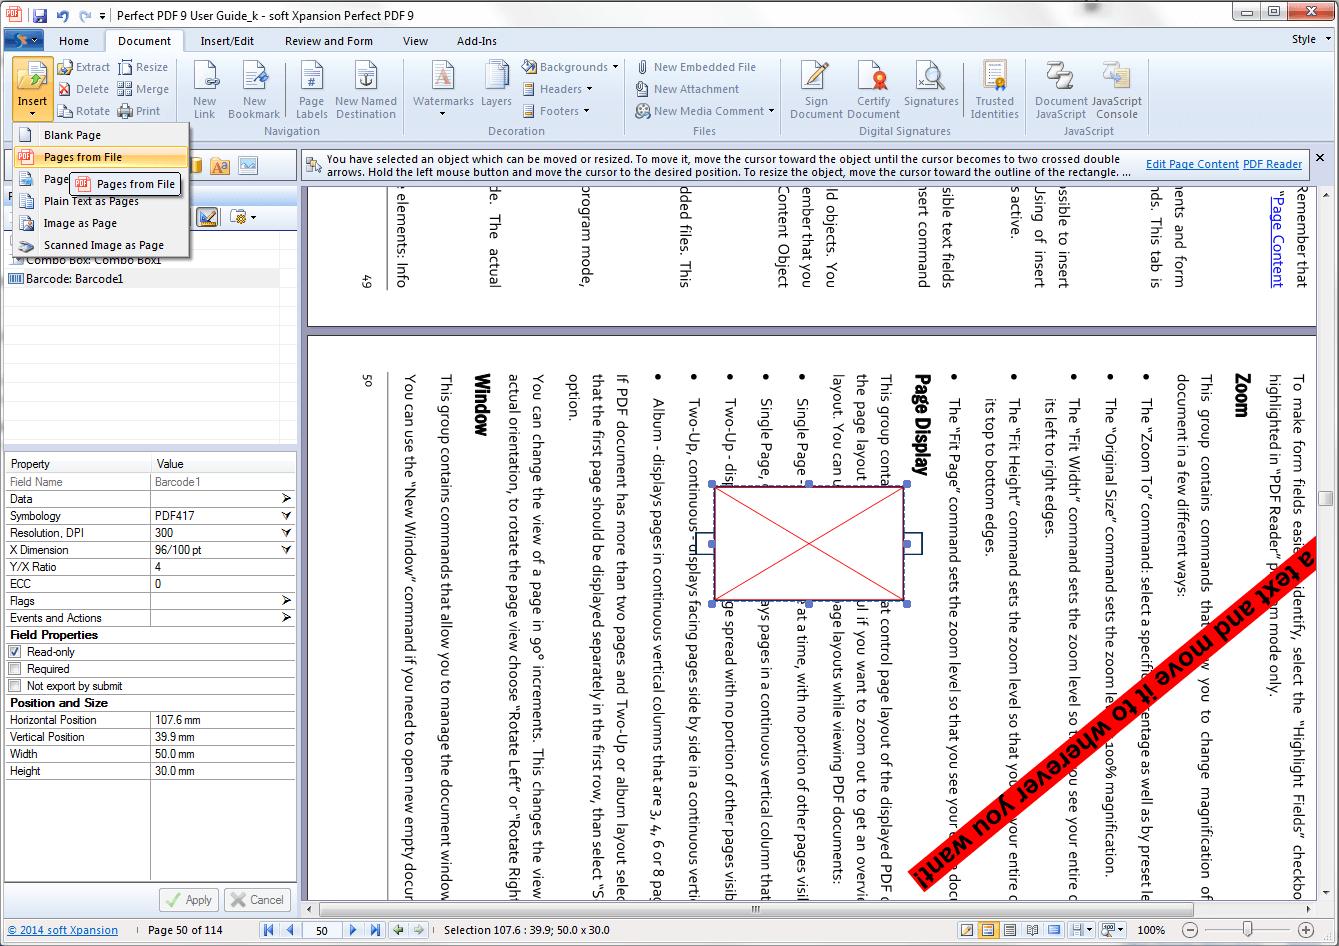 Perfect PDF 9 Editor 4